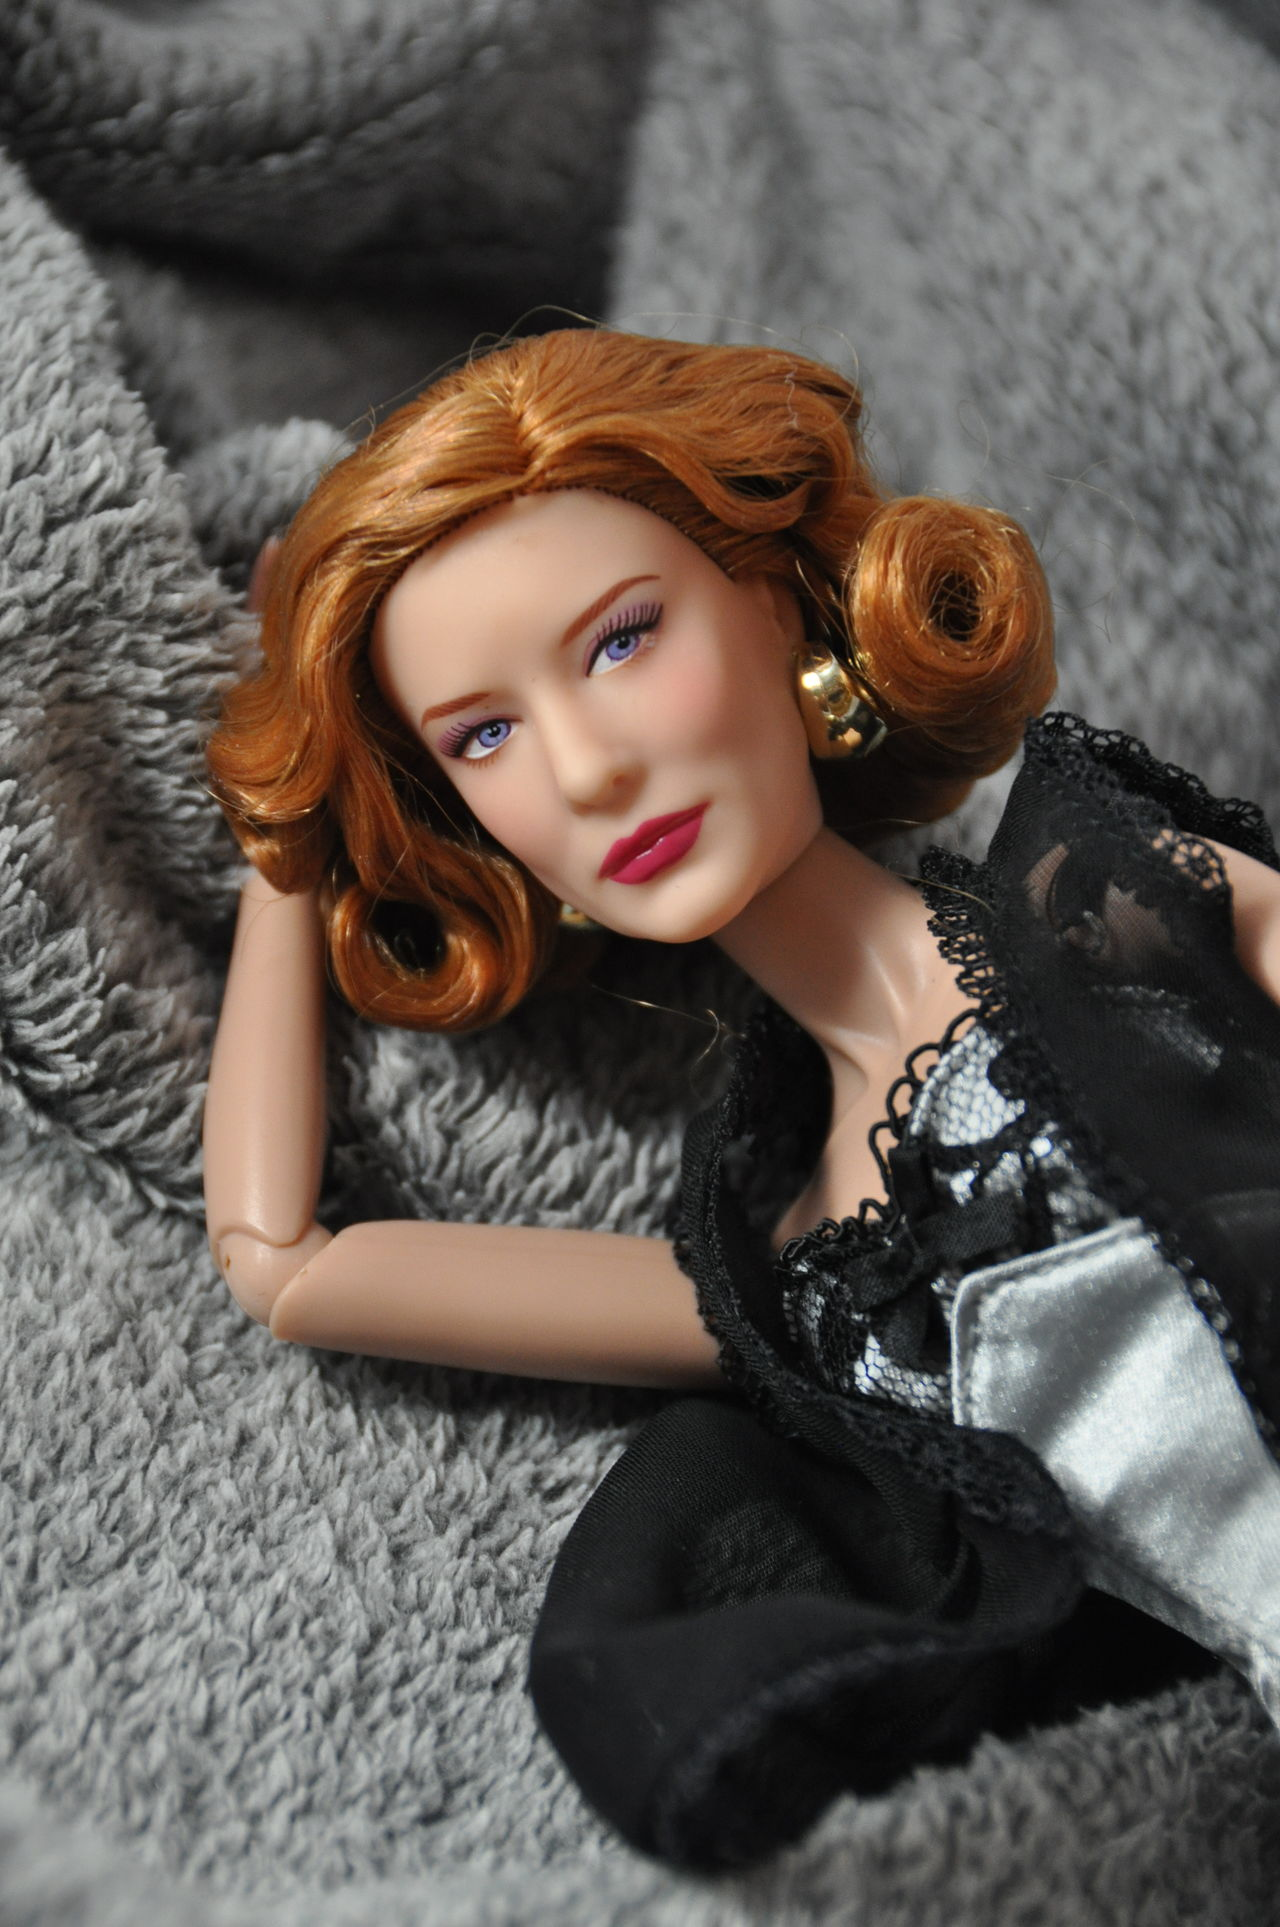 Barbie Barbie Collector Bollywood Cate Blanchett  Den Haag Doll Fashion Doll Fashion Photography Fashion Royalty Fisiomilano Holly Hollywood Miniature